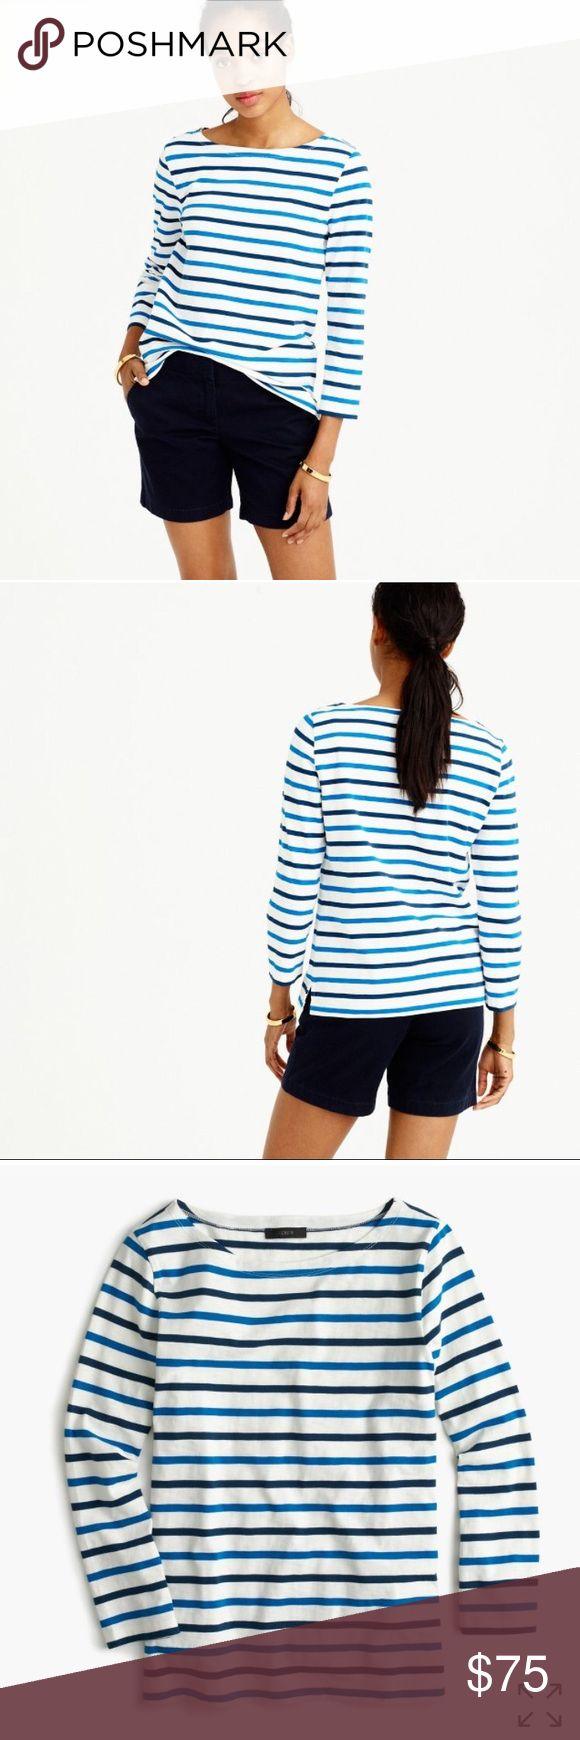 J CREW boatneck striped shirt NWT XXS Super cute striped boatneck J Crew shirt: NWT size XXS J. Crew Tops Tees - Long Sleeve